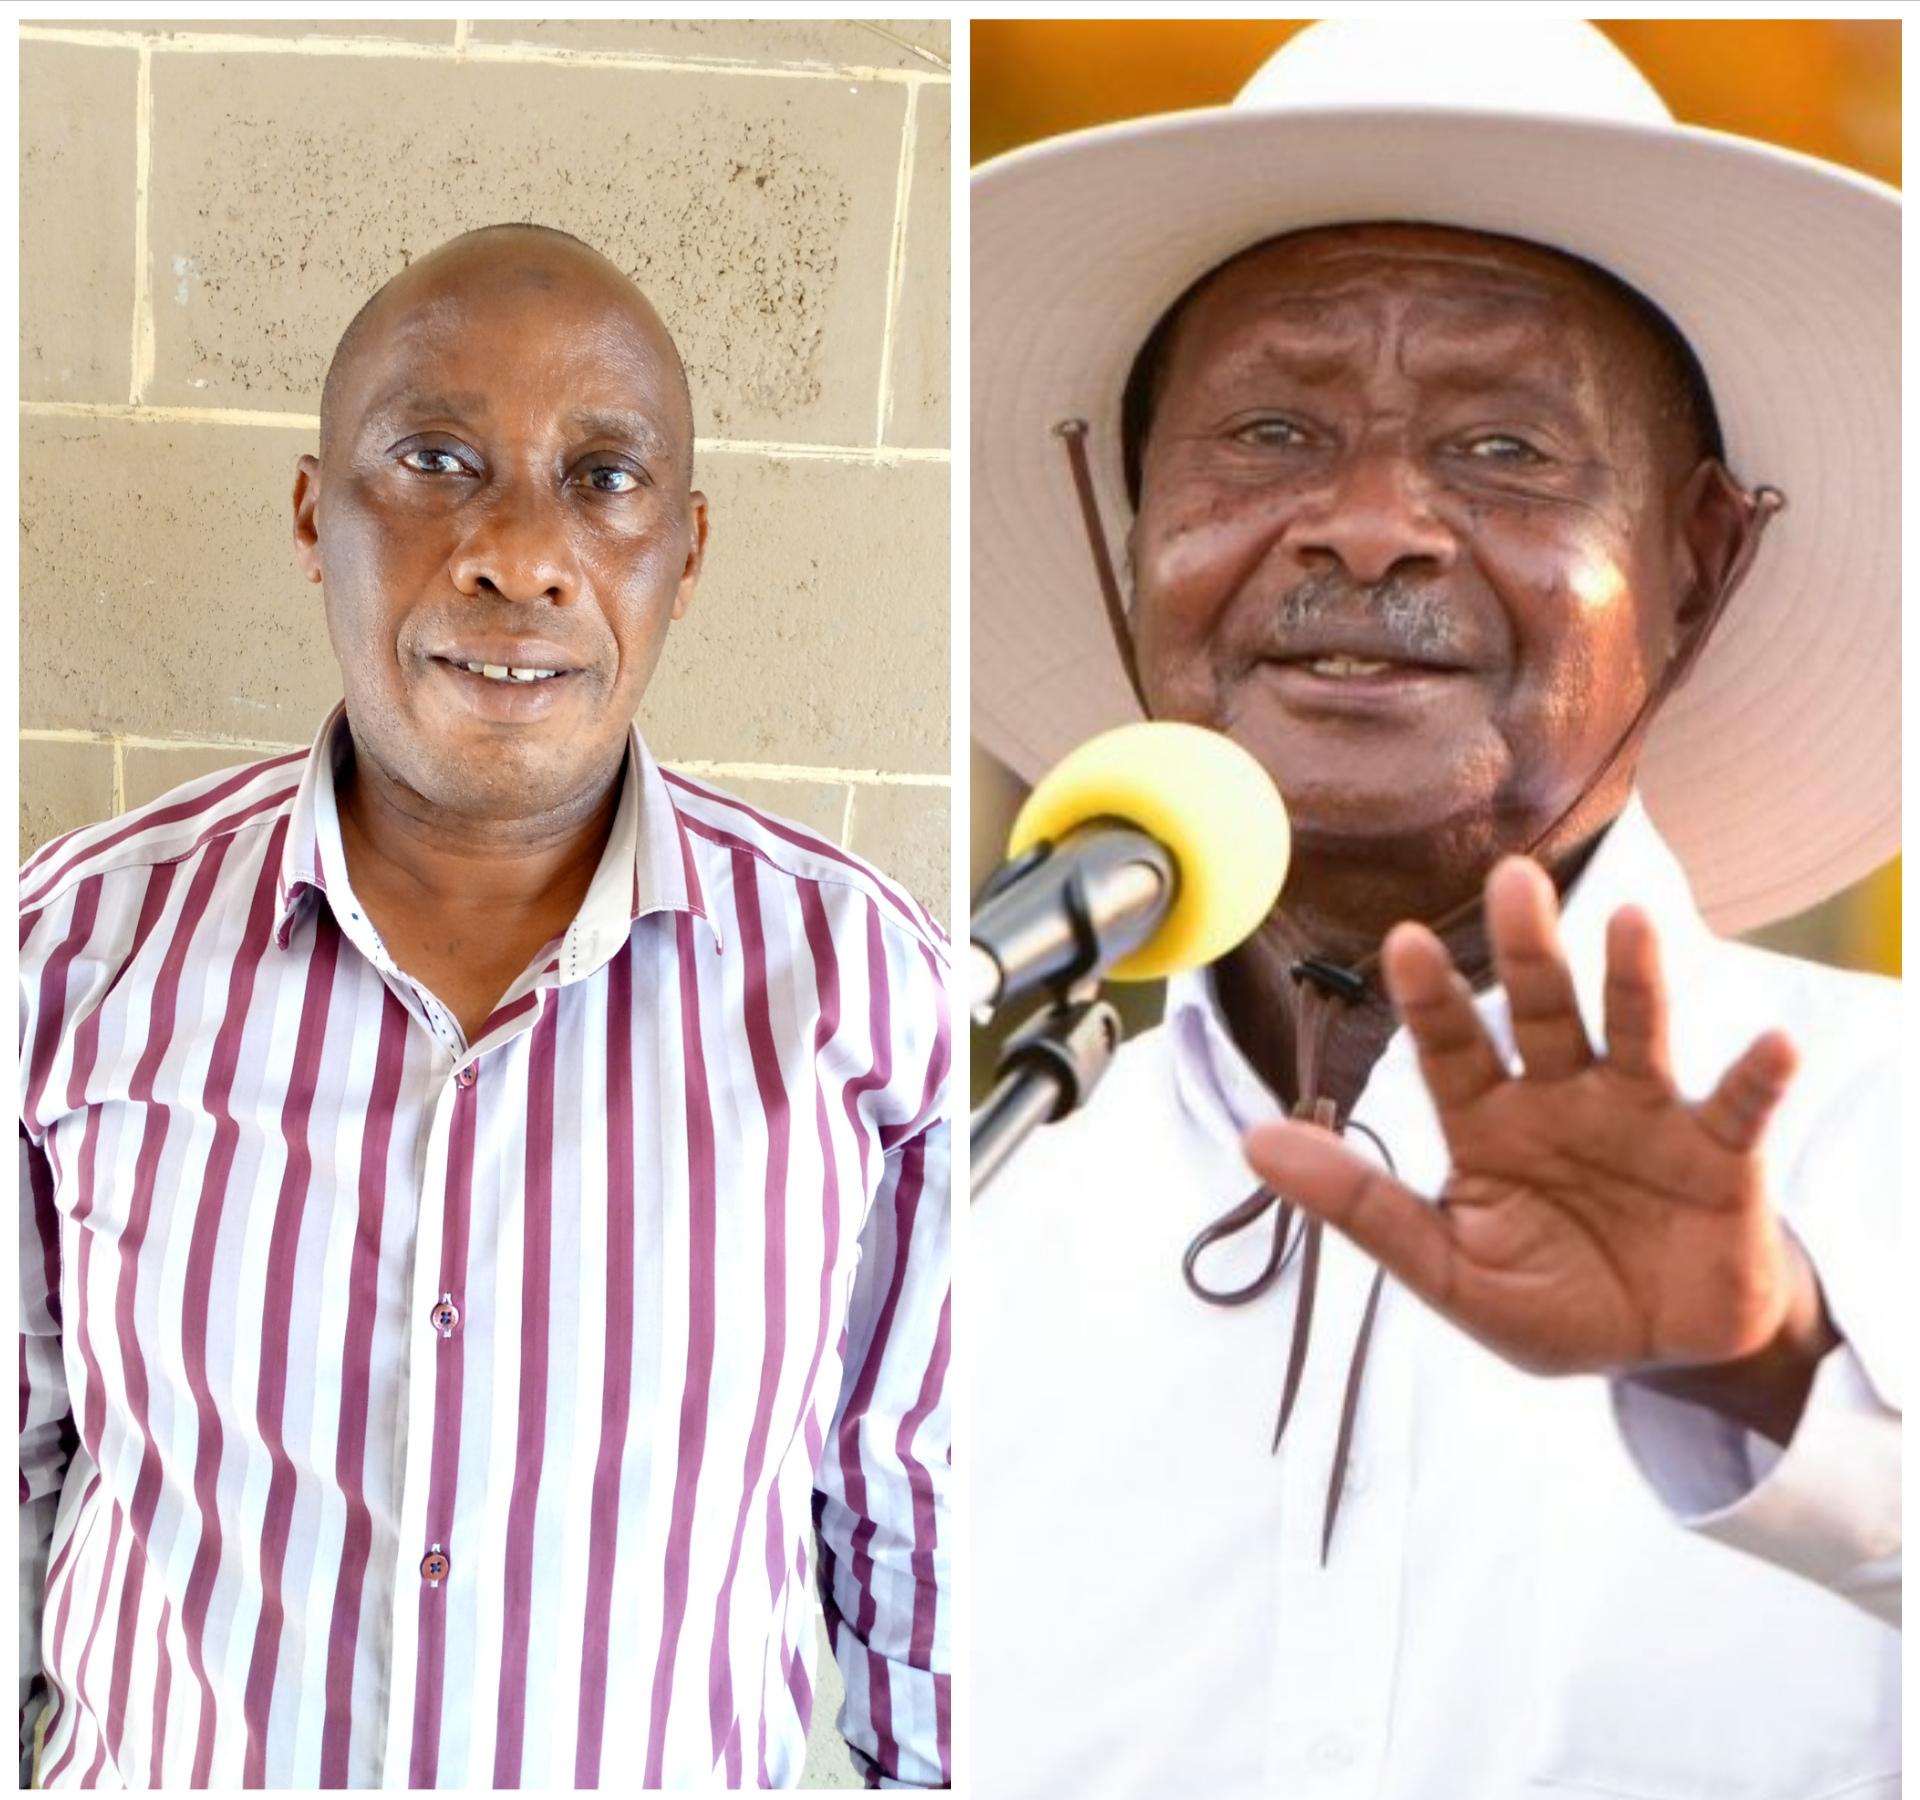 Buvuma Deputy RDC Juma Kigongo and President Museveni